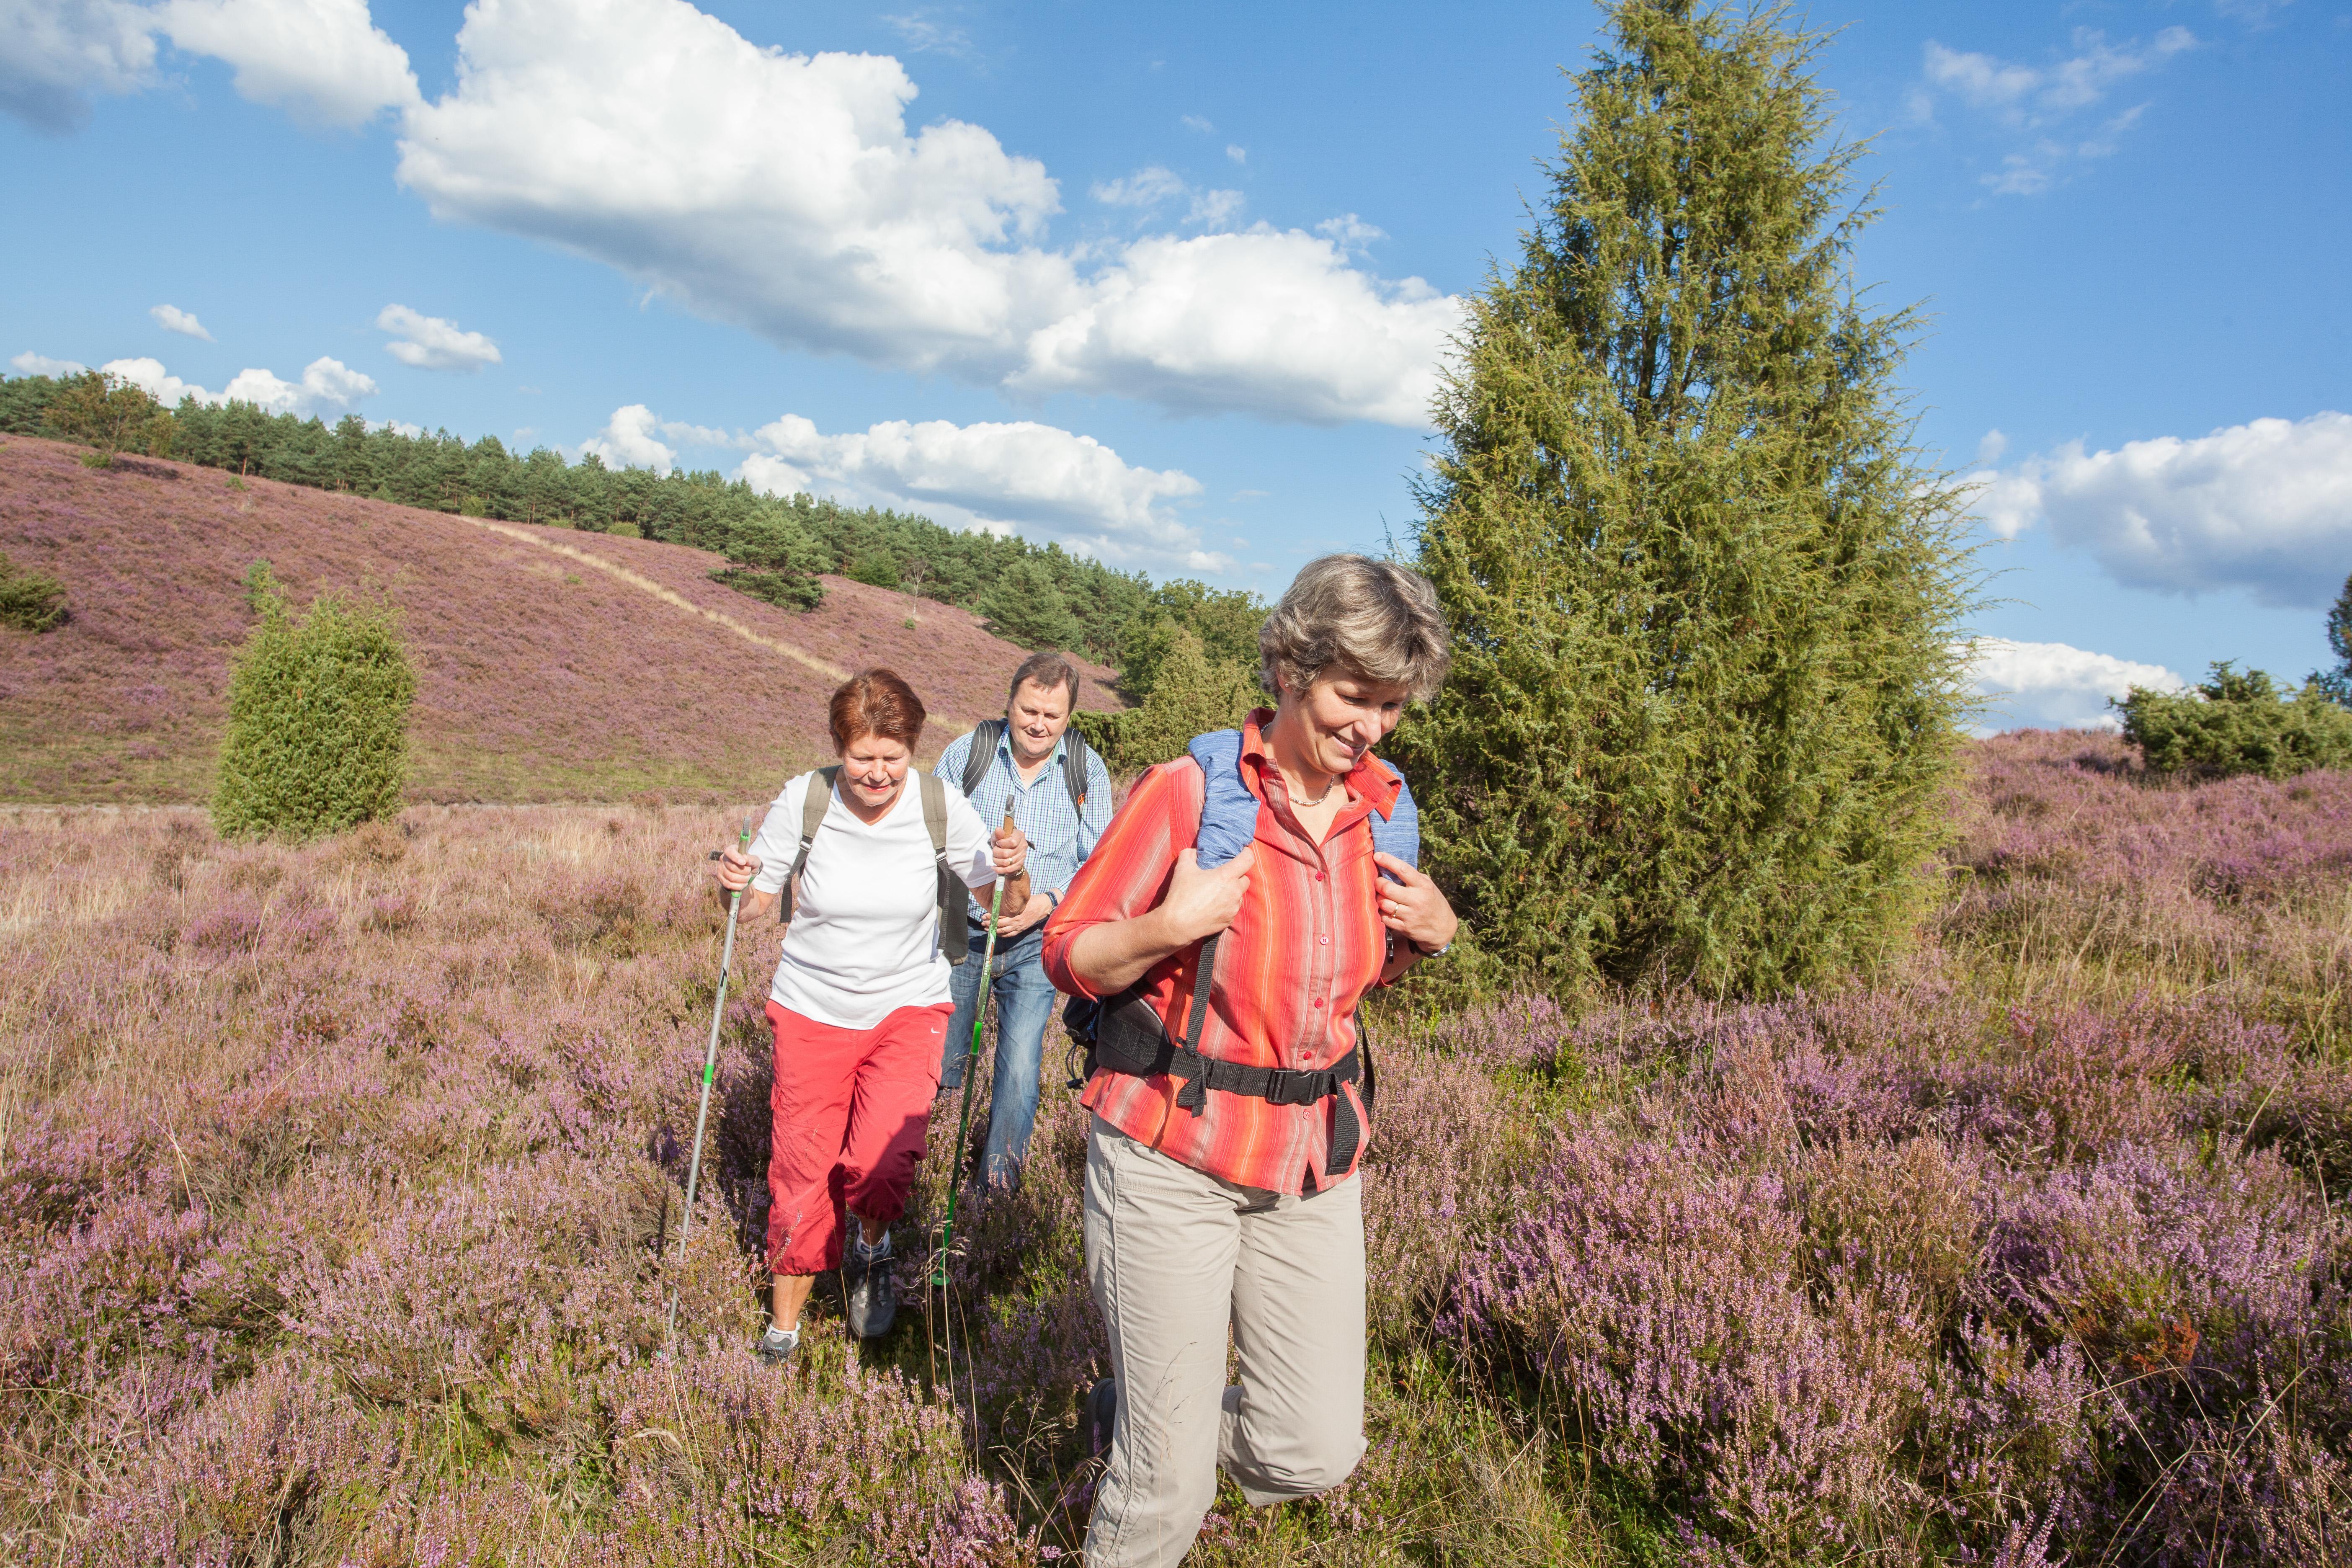 Wandern In Bispingen Lünerburger Heide Wegenetze Heidschnuckenweg